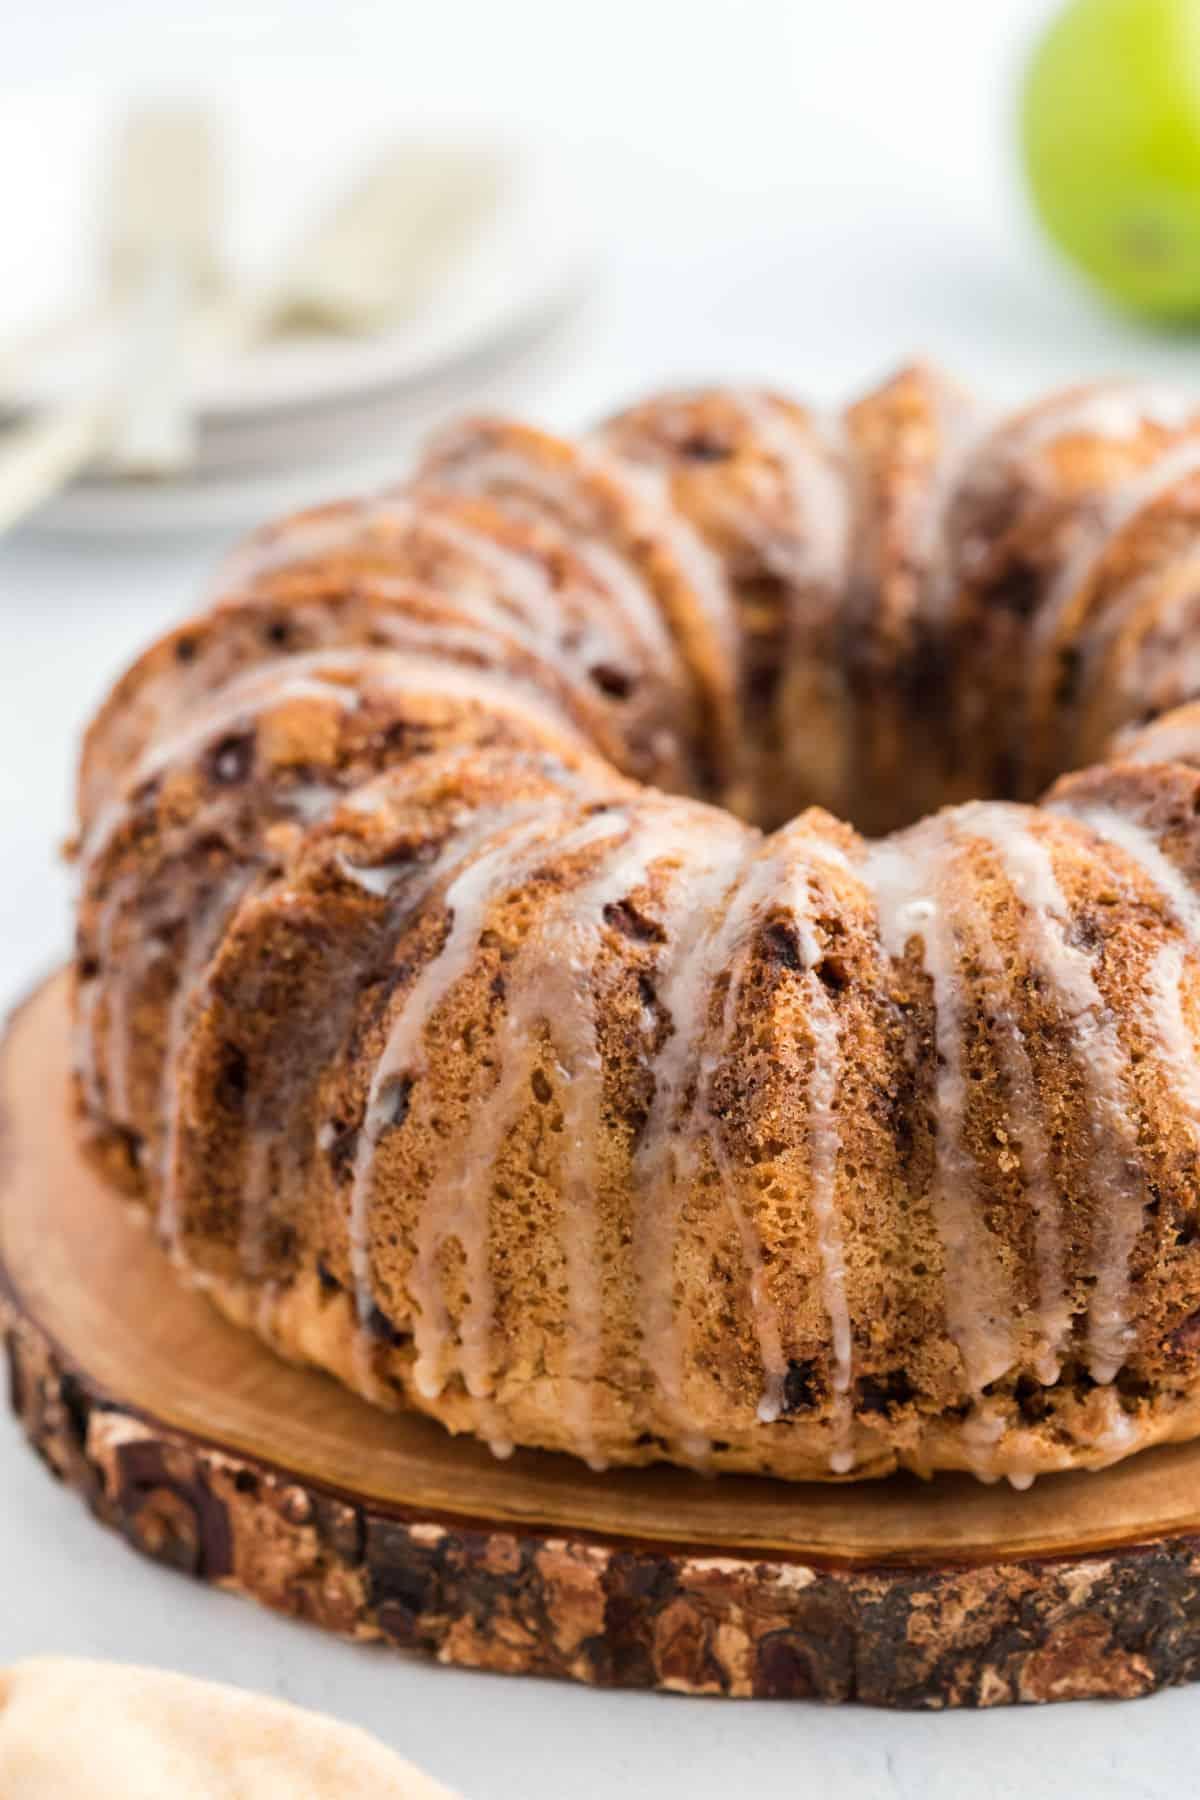 Apple bundt cake on wooden serving plate with a glaze.